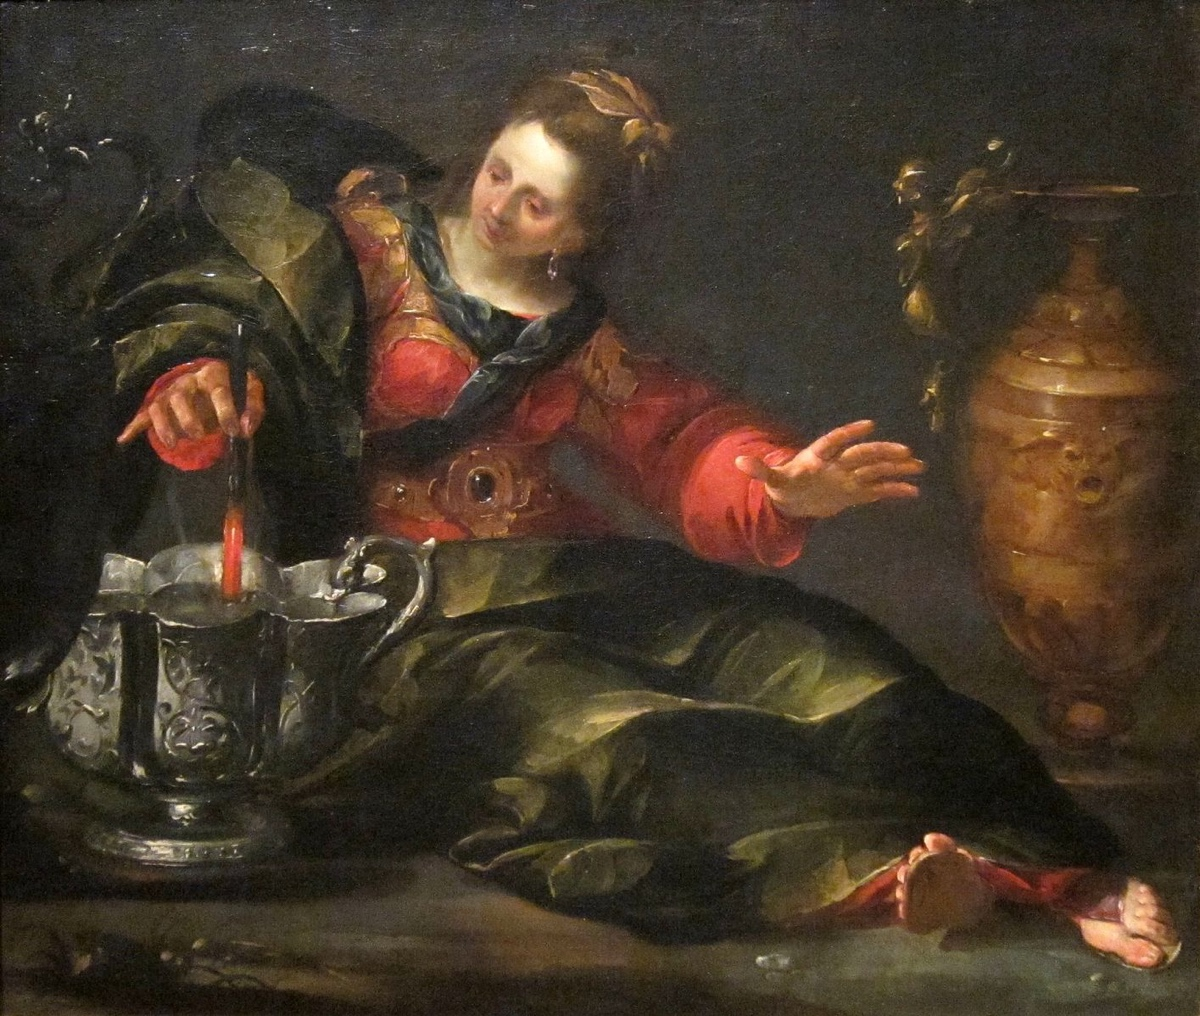 'Circe_Mulling_Wine'_by_Gioacchino_Assereto,_Dayton_Art_Institute